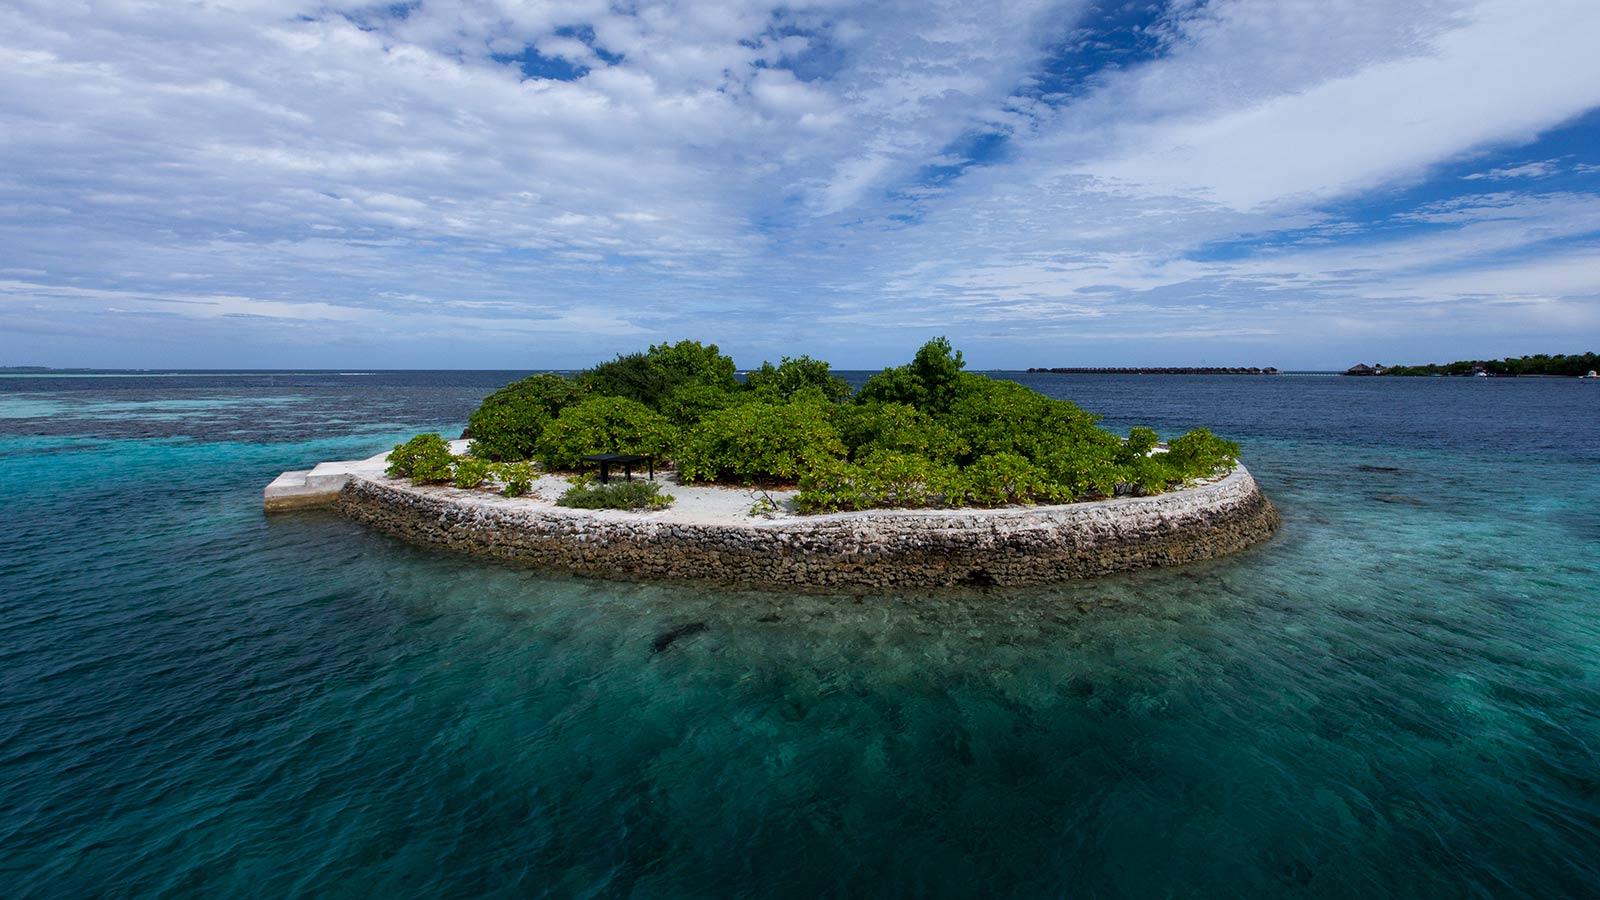 Sun Lily at Lily Beach Maldives